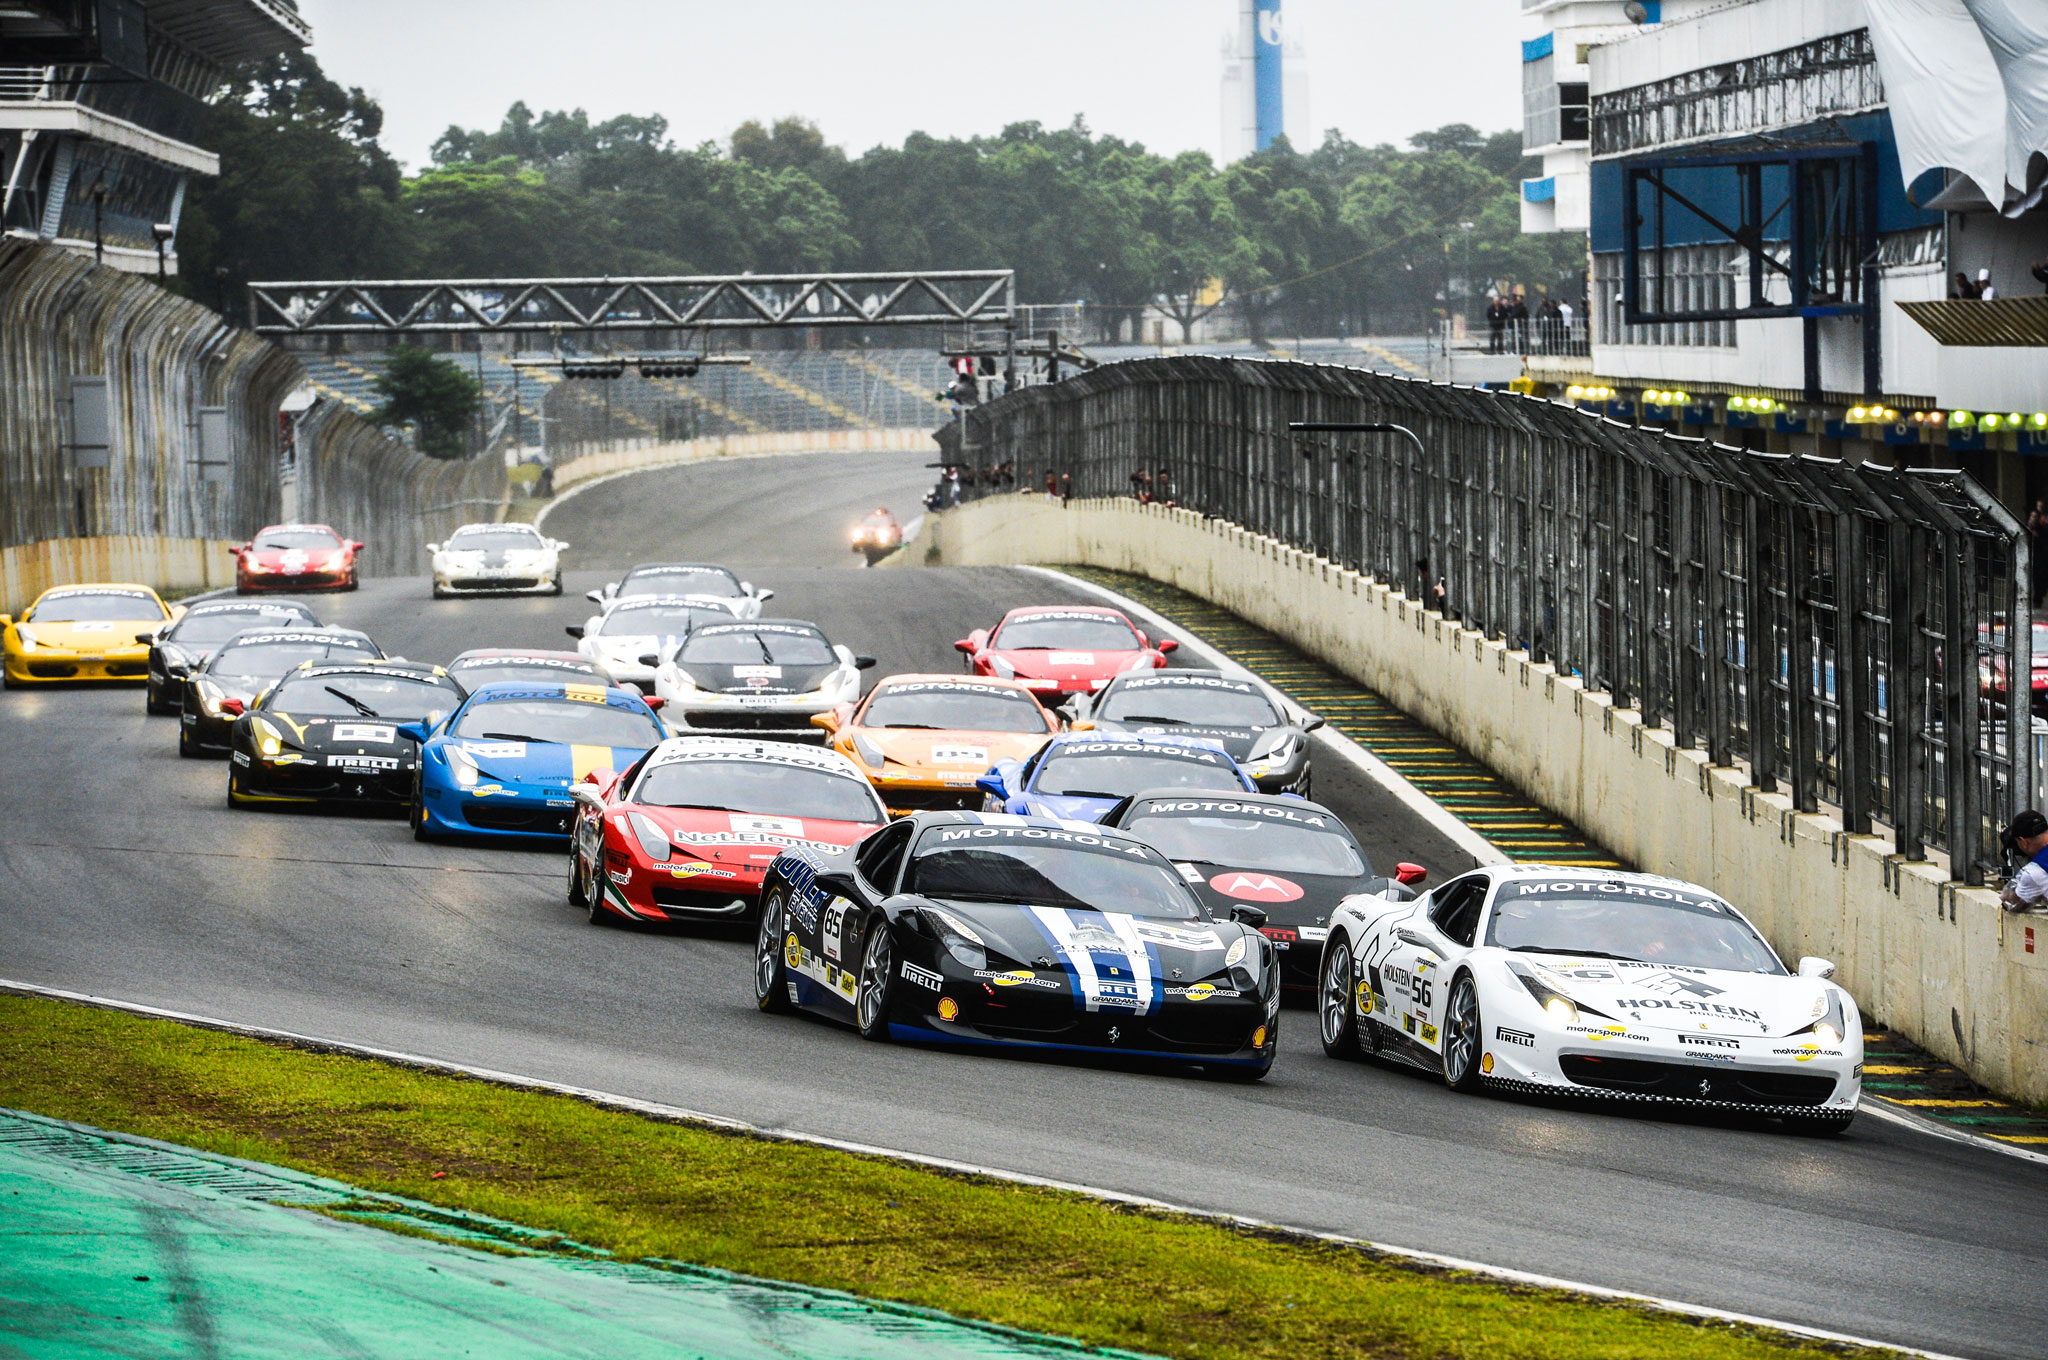 Ferraris On Track1